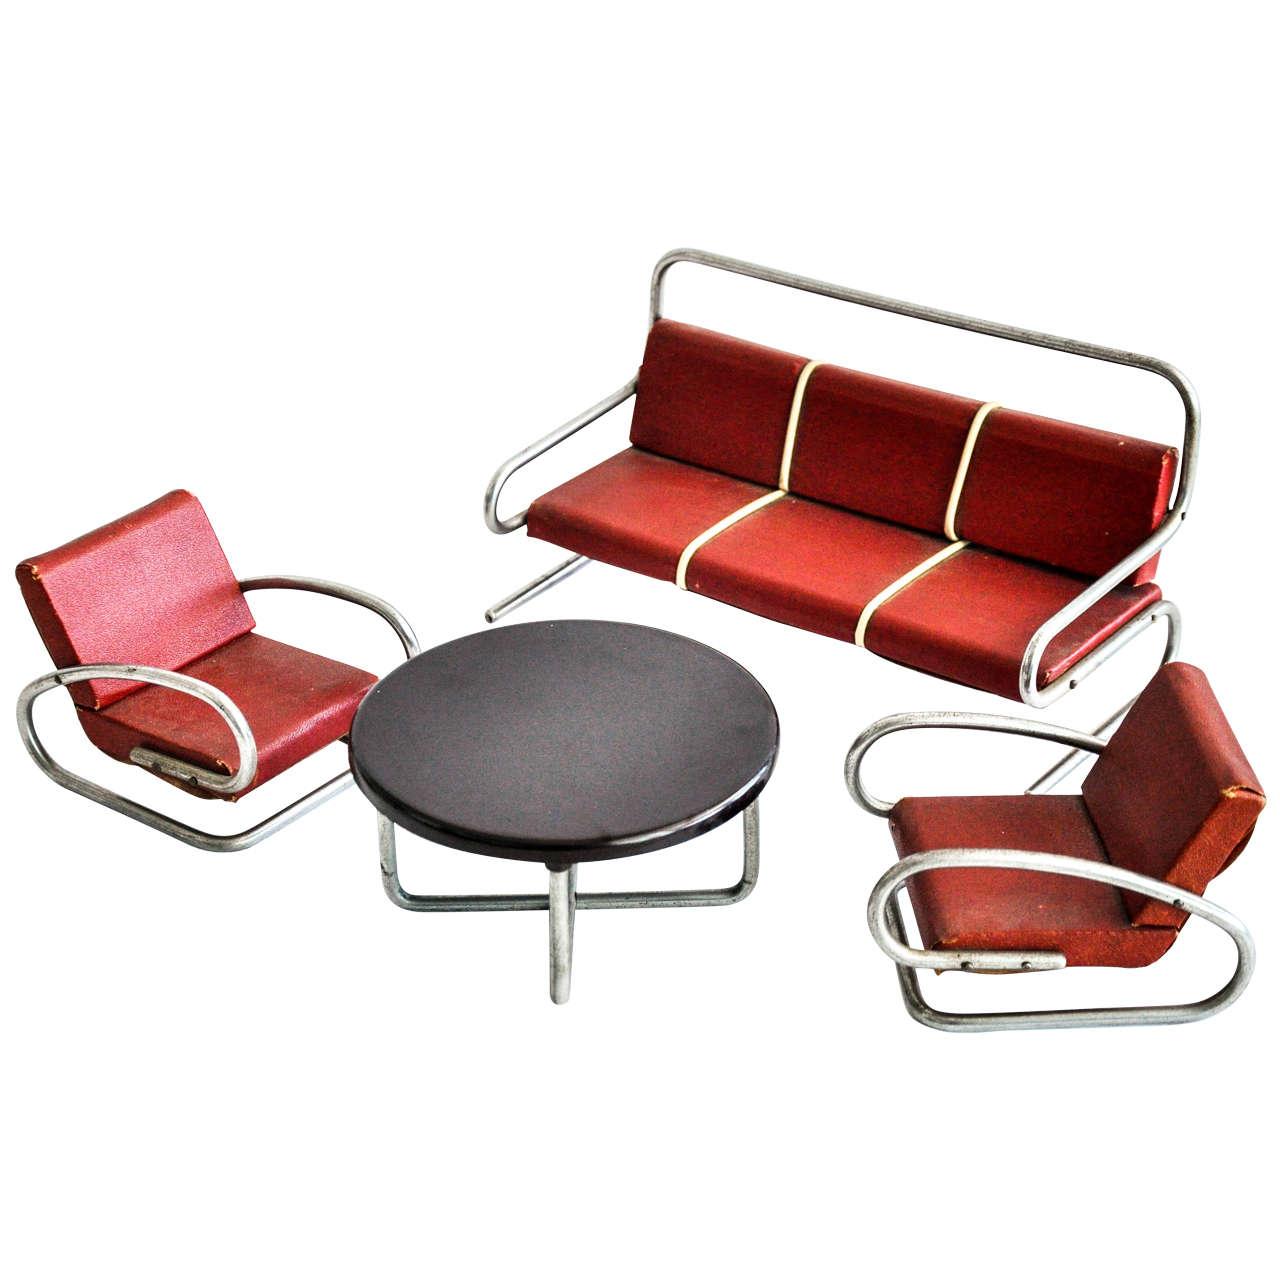 Art Deco/Bauhaus Salesman's Sample Furniture Group/Jindrich Halabala For Sale